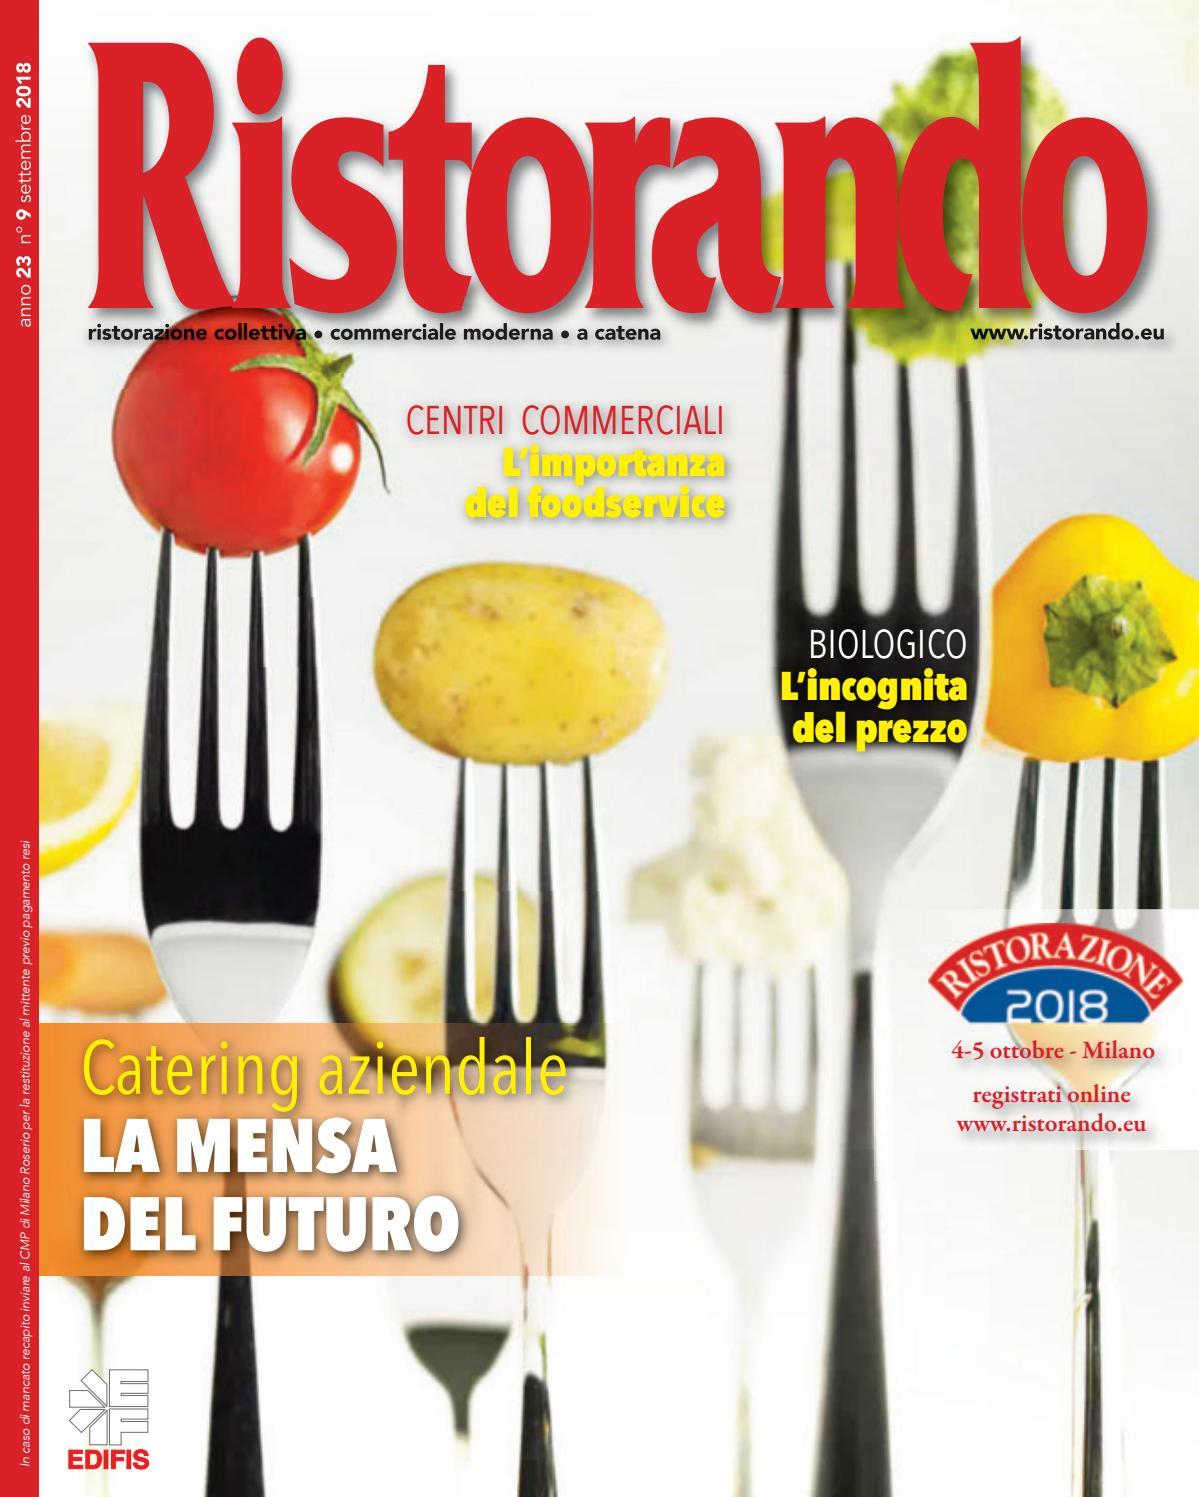 Mille Gusti Nova Milanese Prezzi ristorando 09 2018 by edifis - issuu